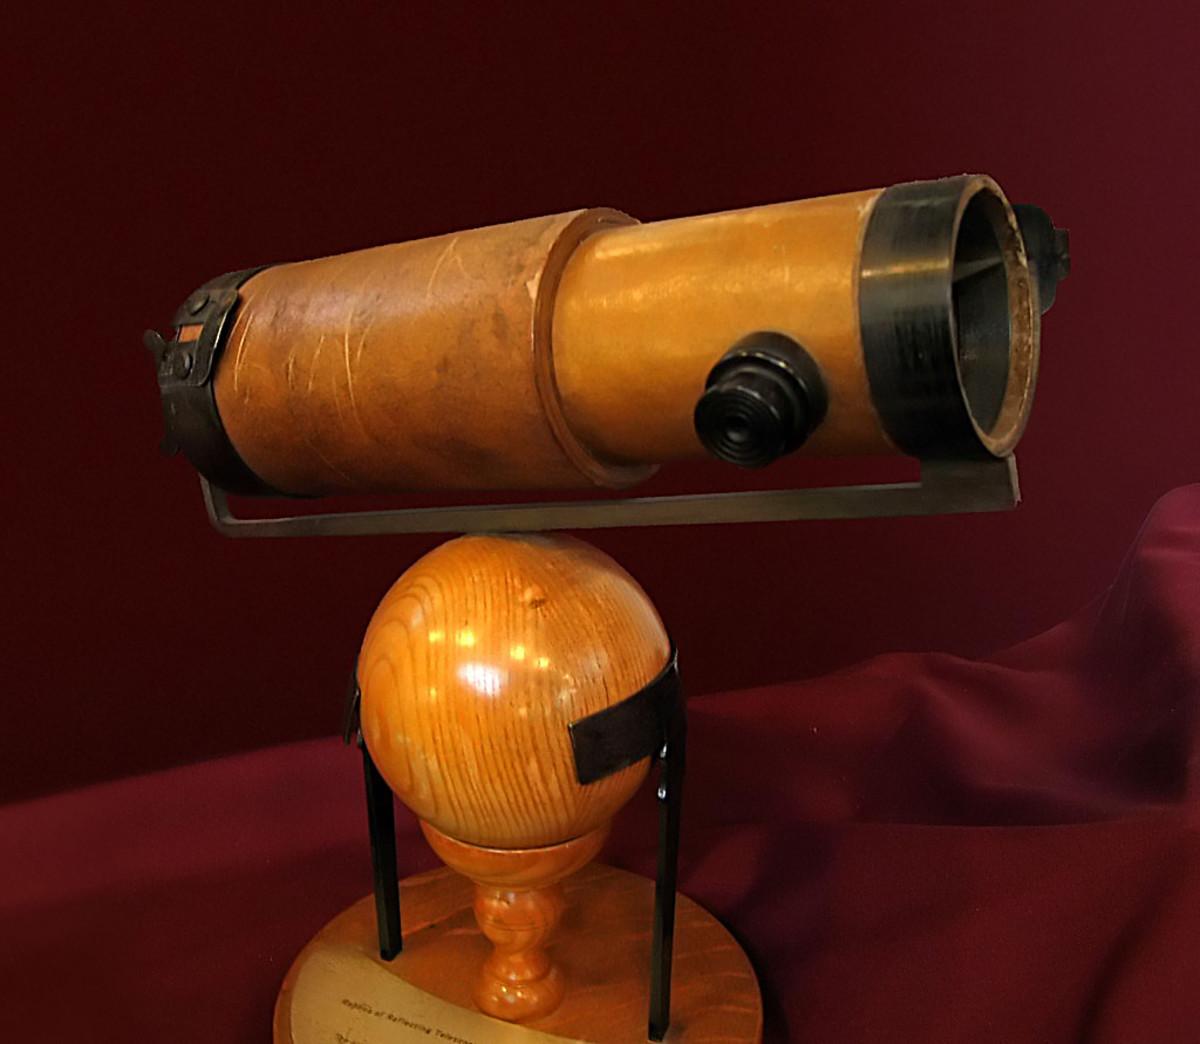 SIR ISAAC NEWTON'S TELESCOPE